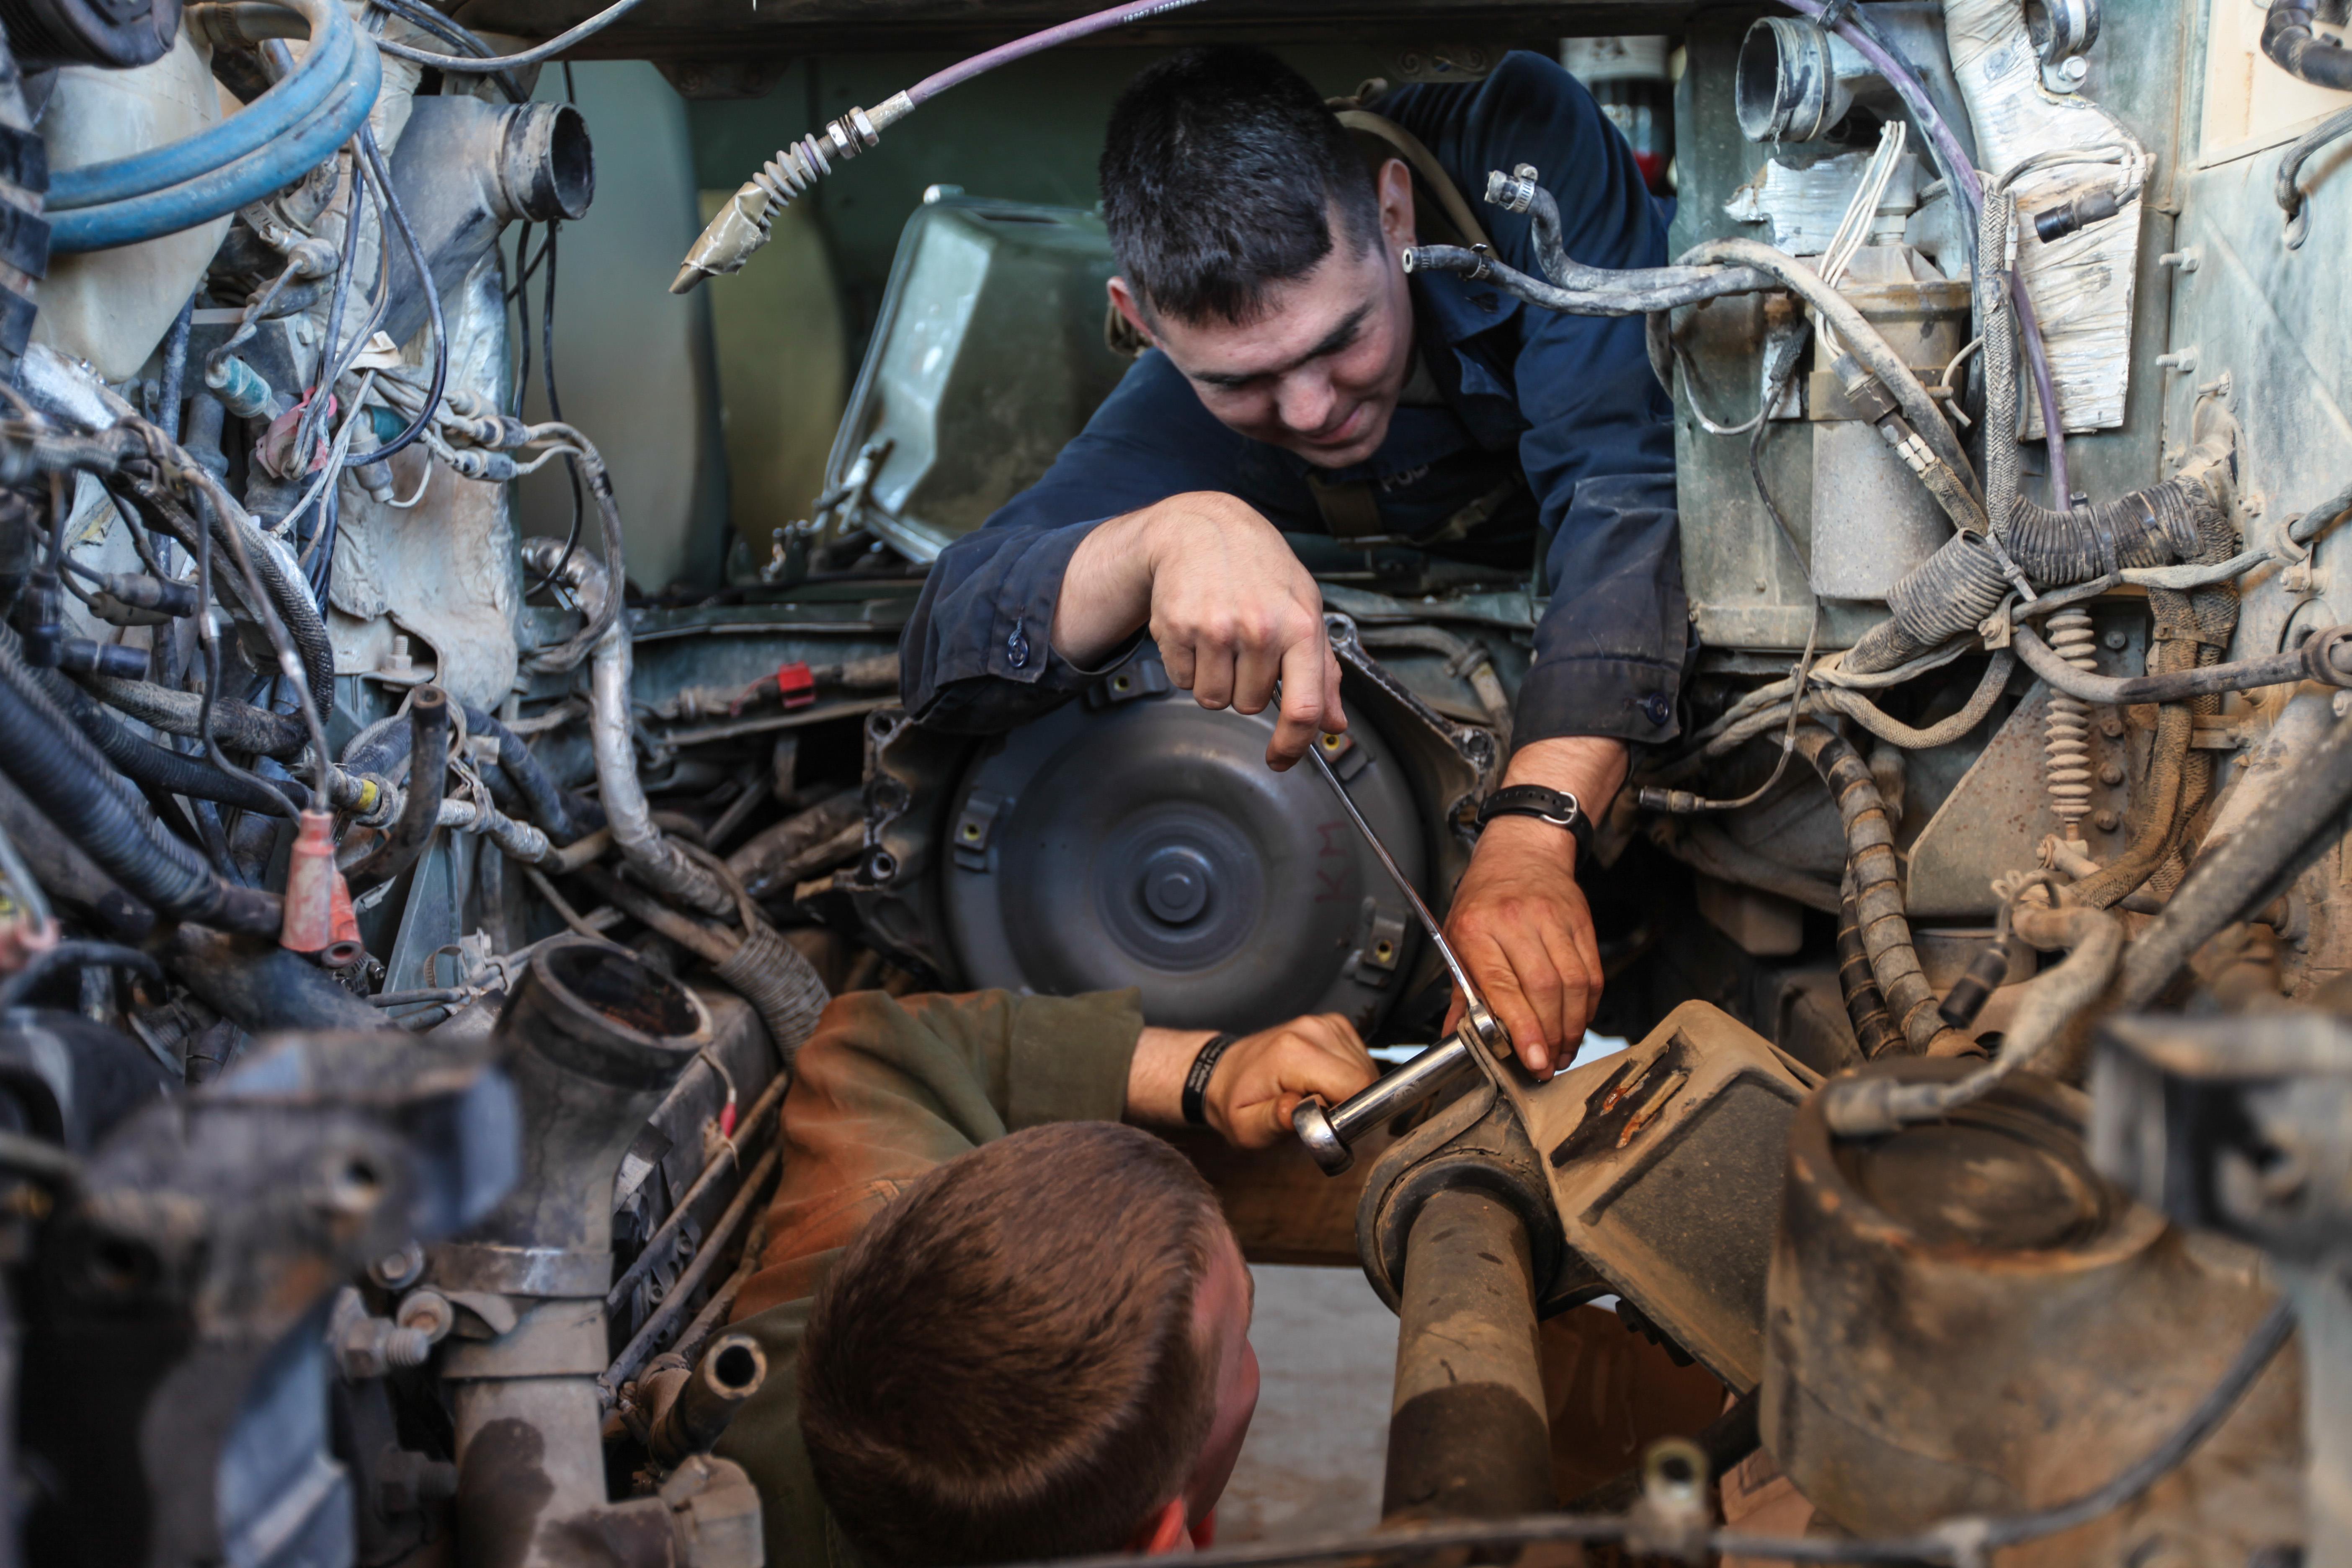 maintenance keeps meu rolling in koolendong  u0026gt  31st marine expeditionary unit  u0026gt  news article view